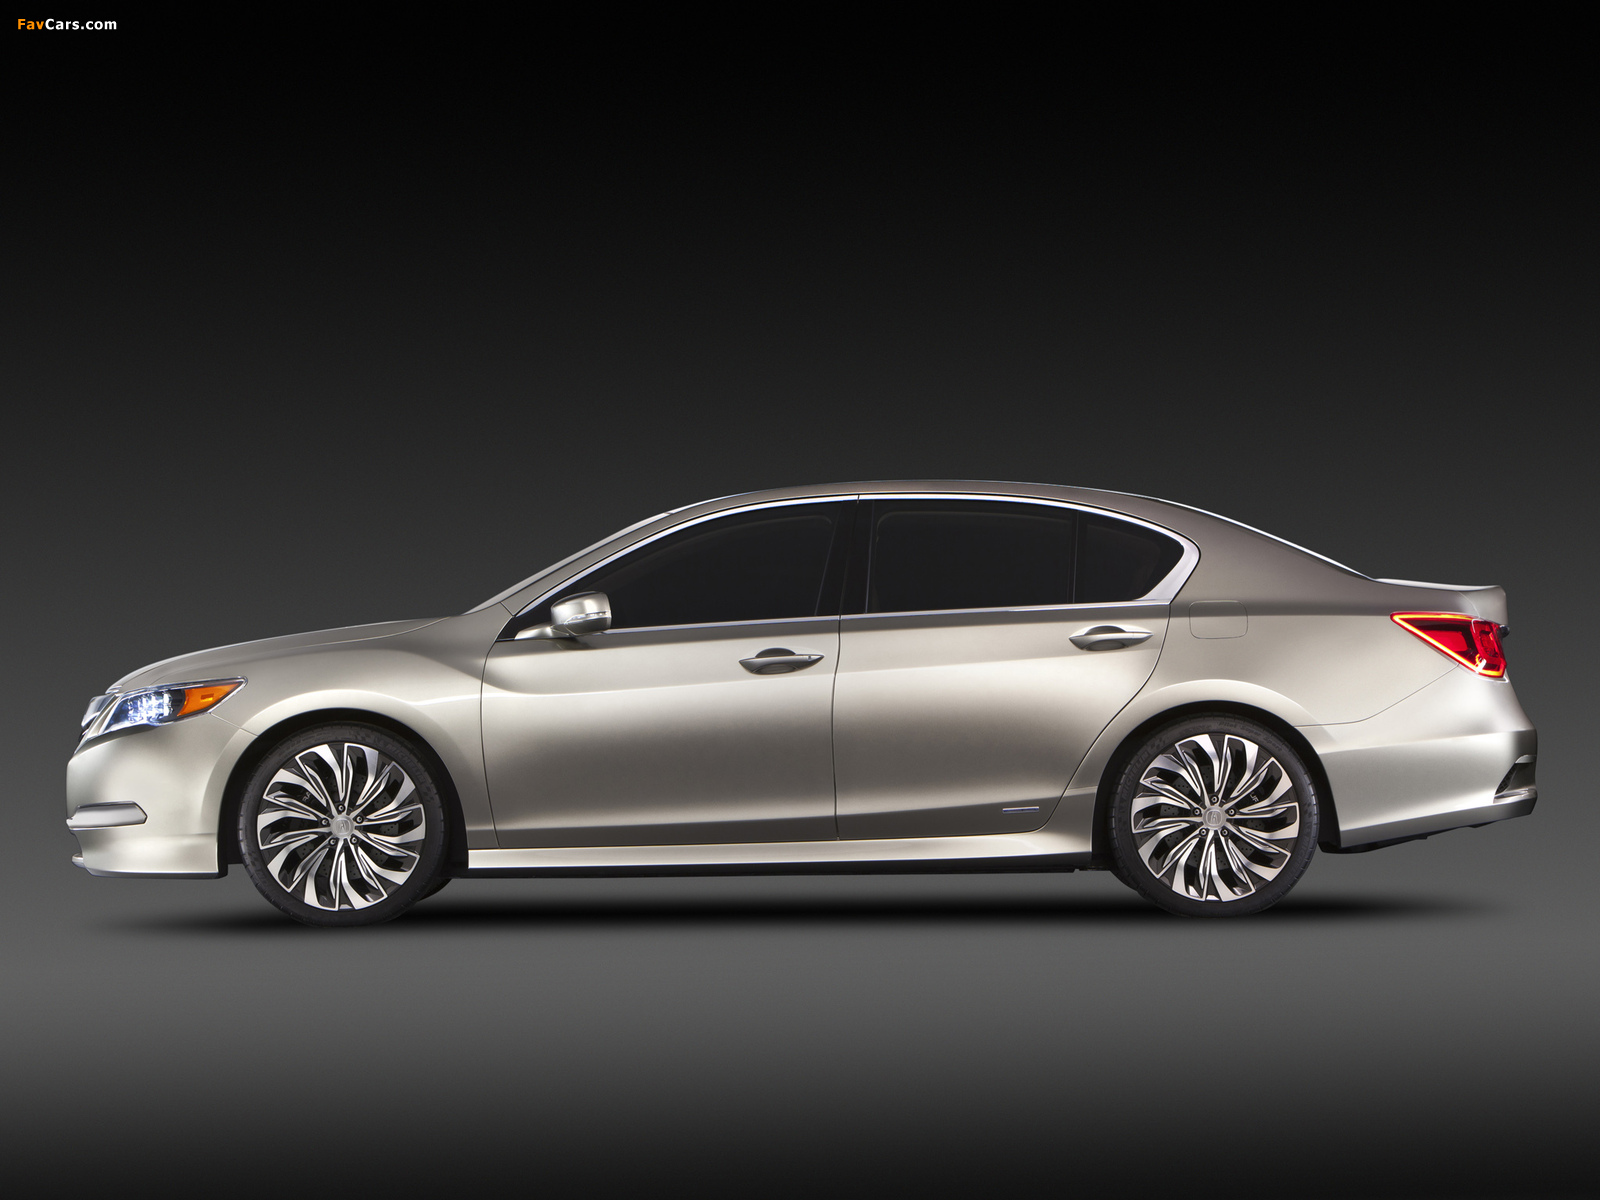 Acura RLX Concept (2012) pictures (1600 x 1200)